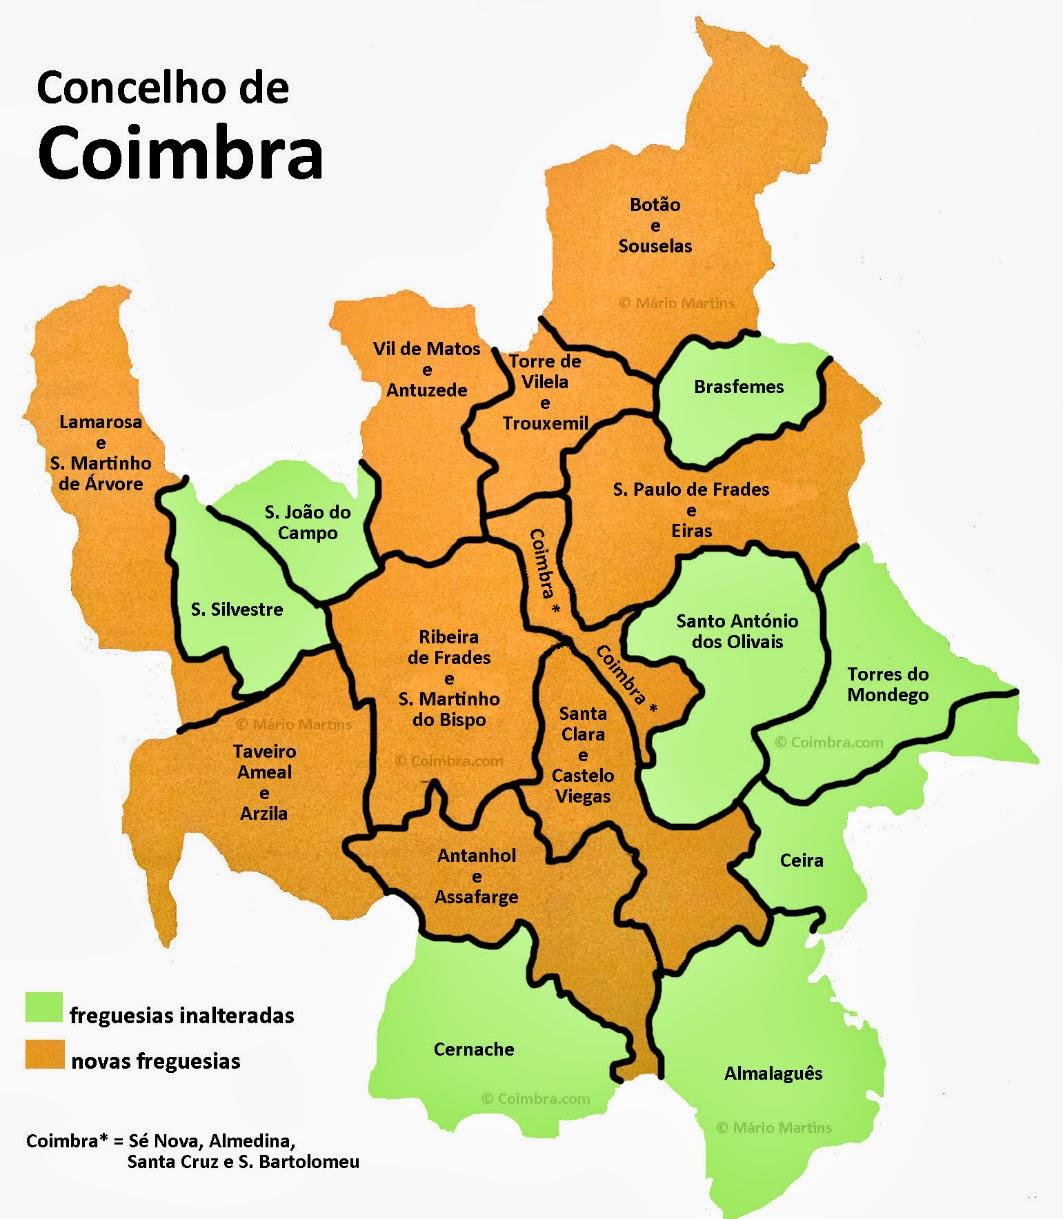 mapa das freguesias de coimbra Coimbra.com: Coimbra cresce: são 128.916 os eleitores mapa das freguesias de coimbra